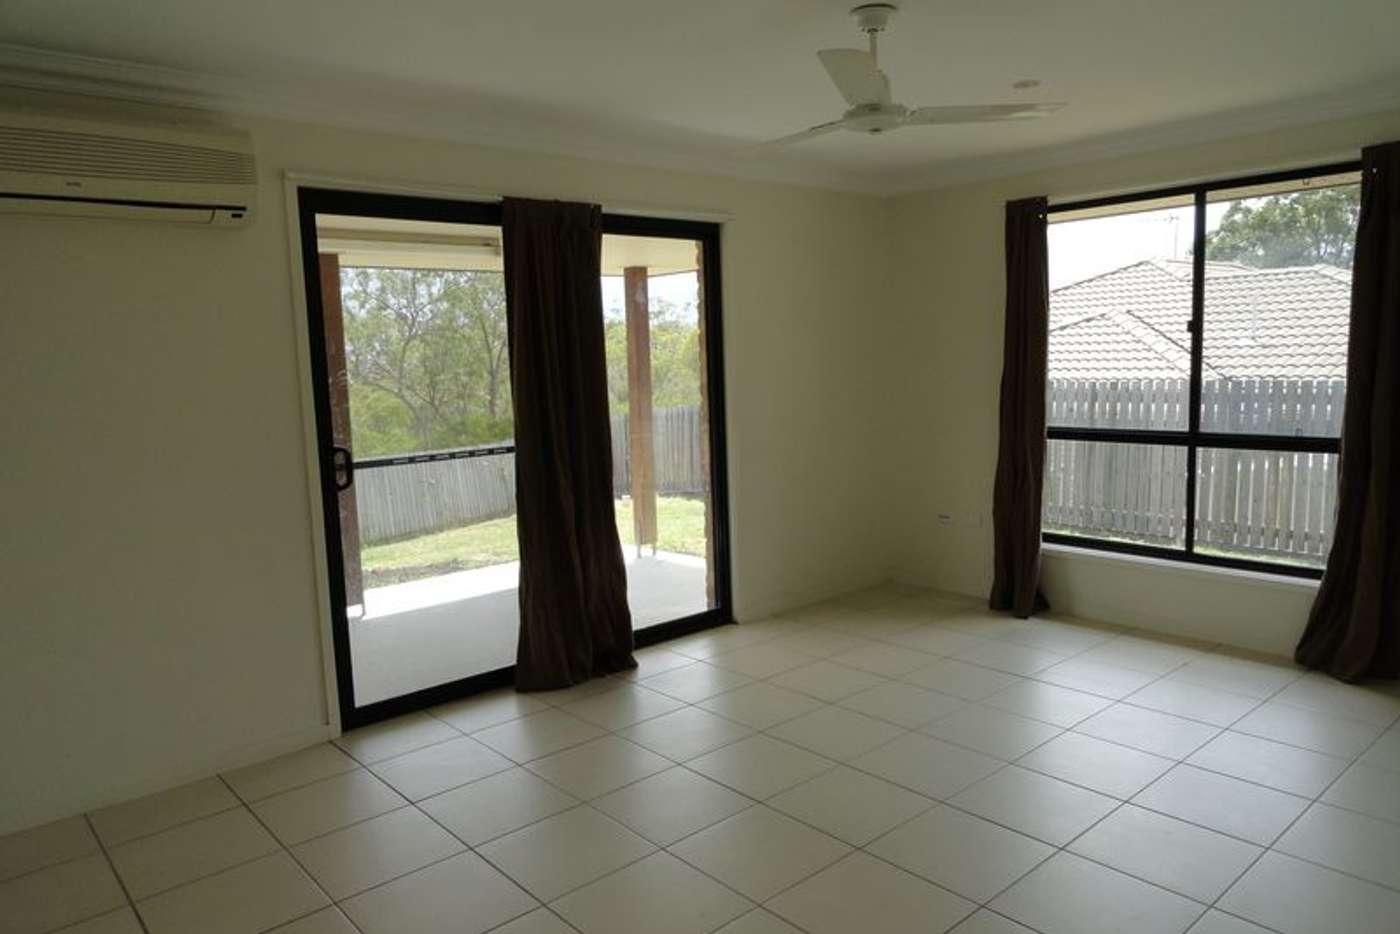 Sixth view of Homely house listing, 8 Bauhinia Street, Boyne Island QLD 4680